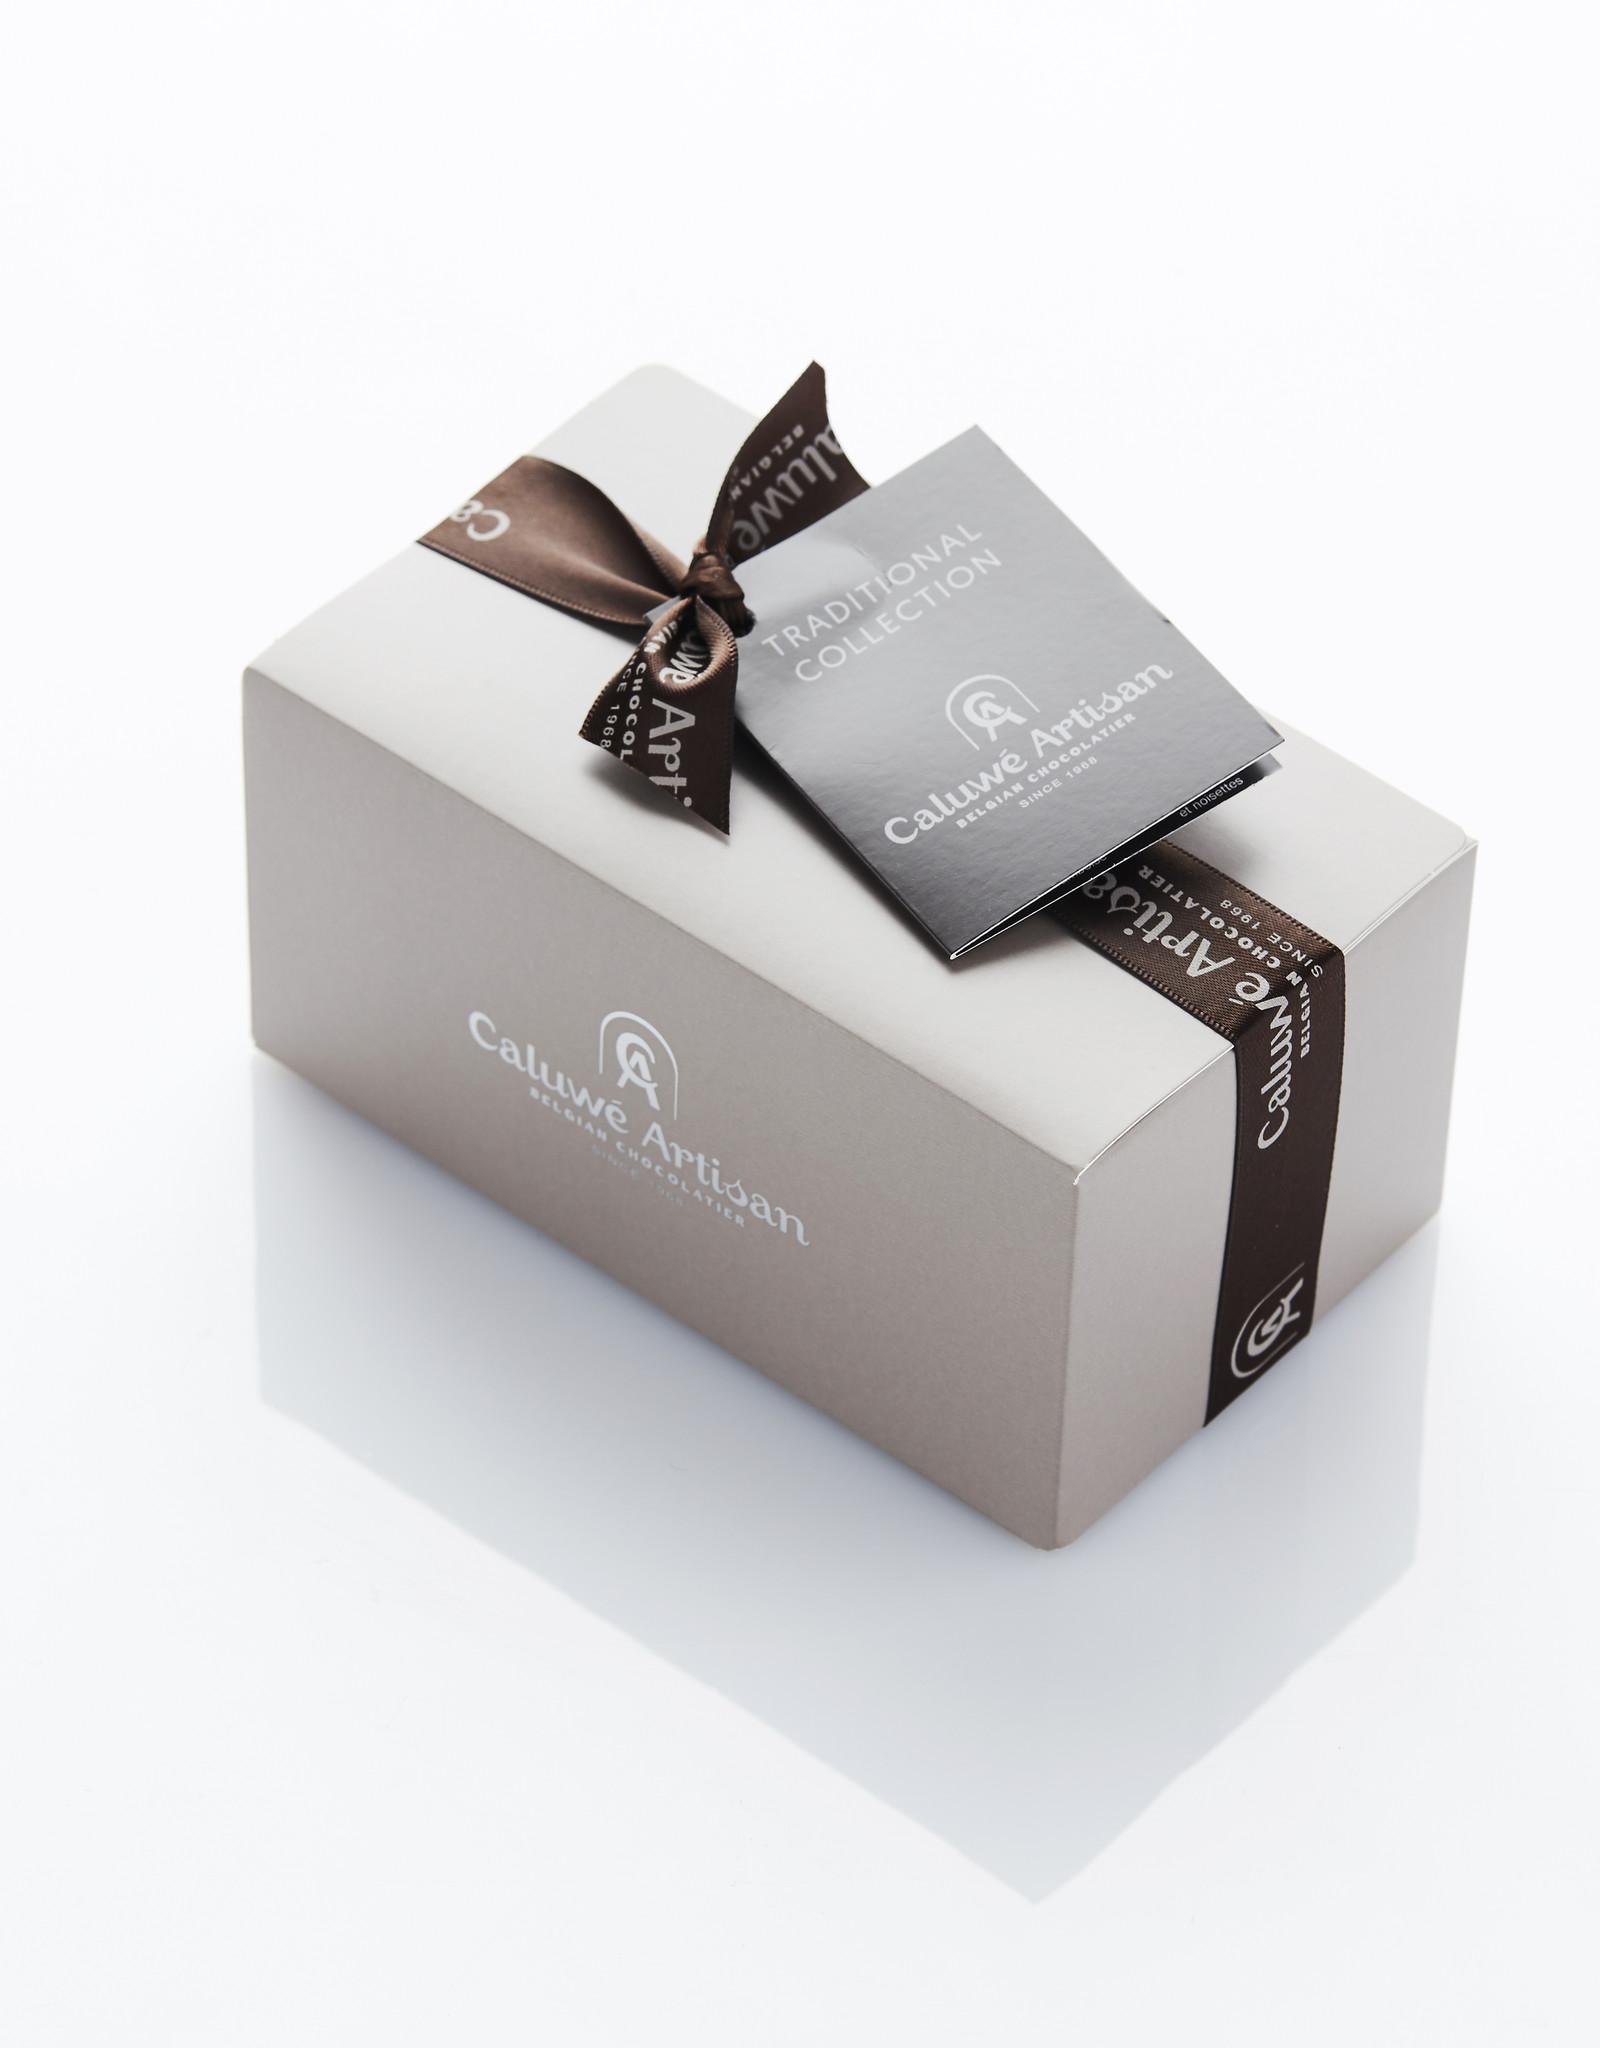 Caluwe Artisan Assortiment de chocolats Belges fourrés